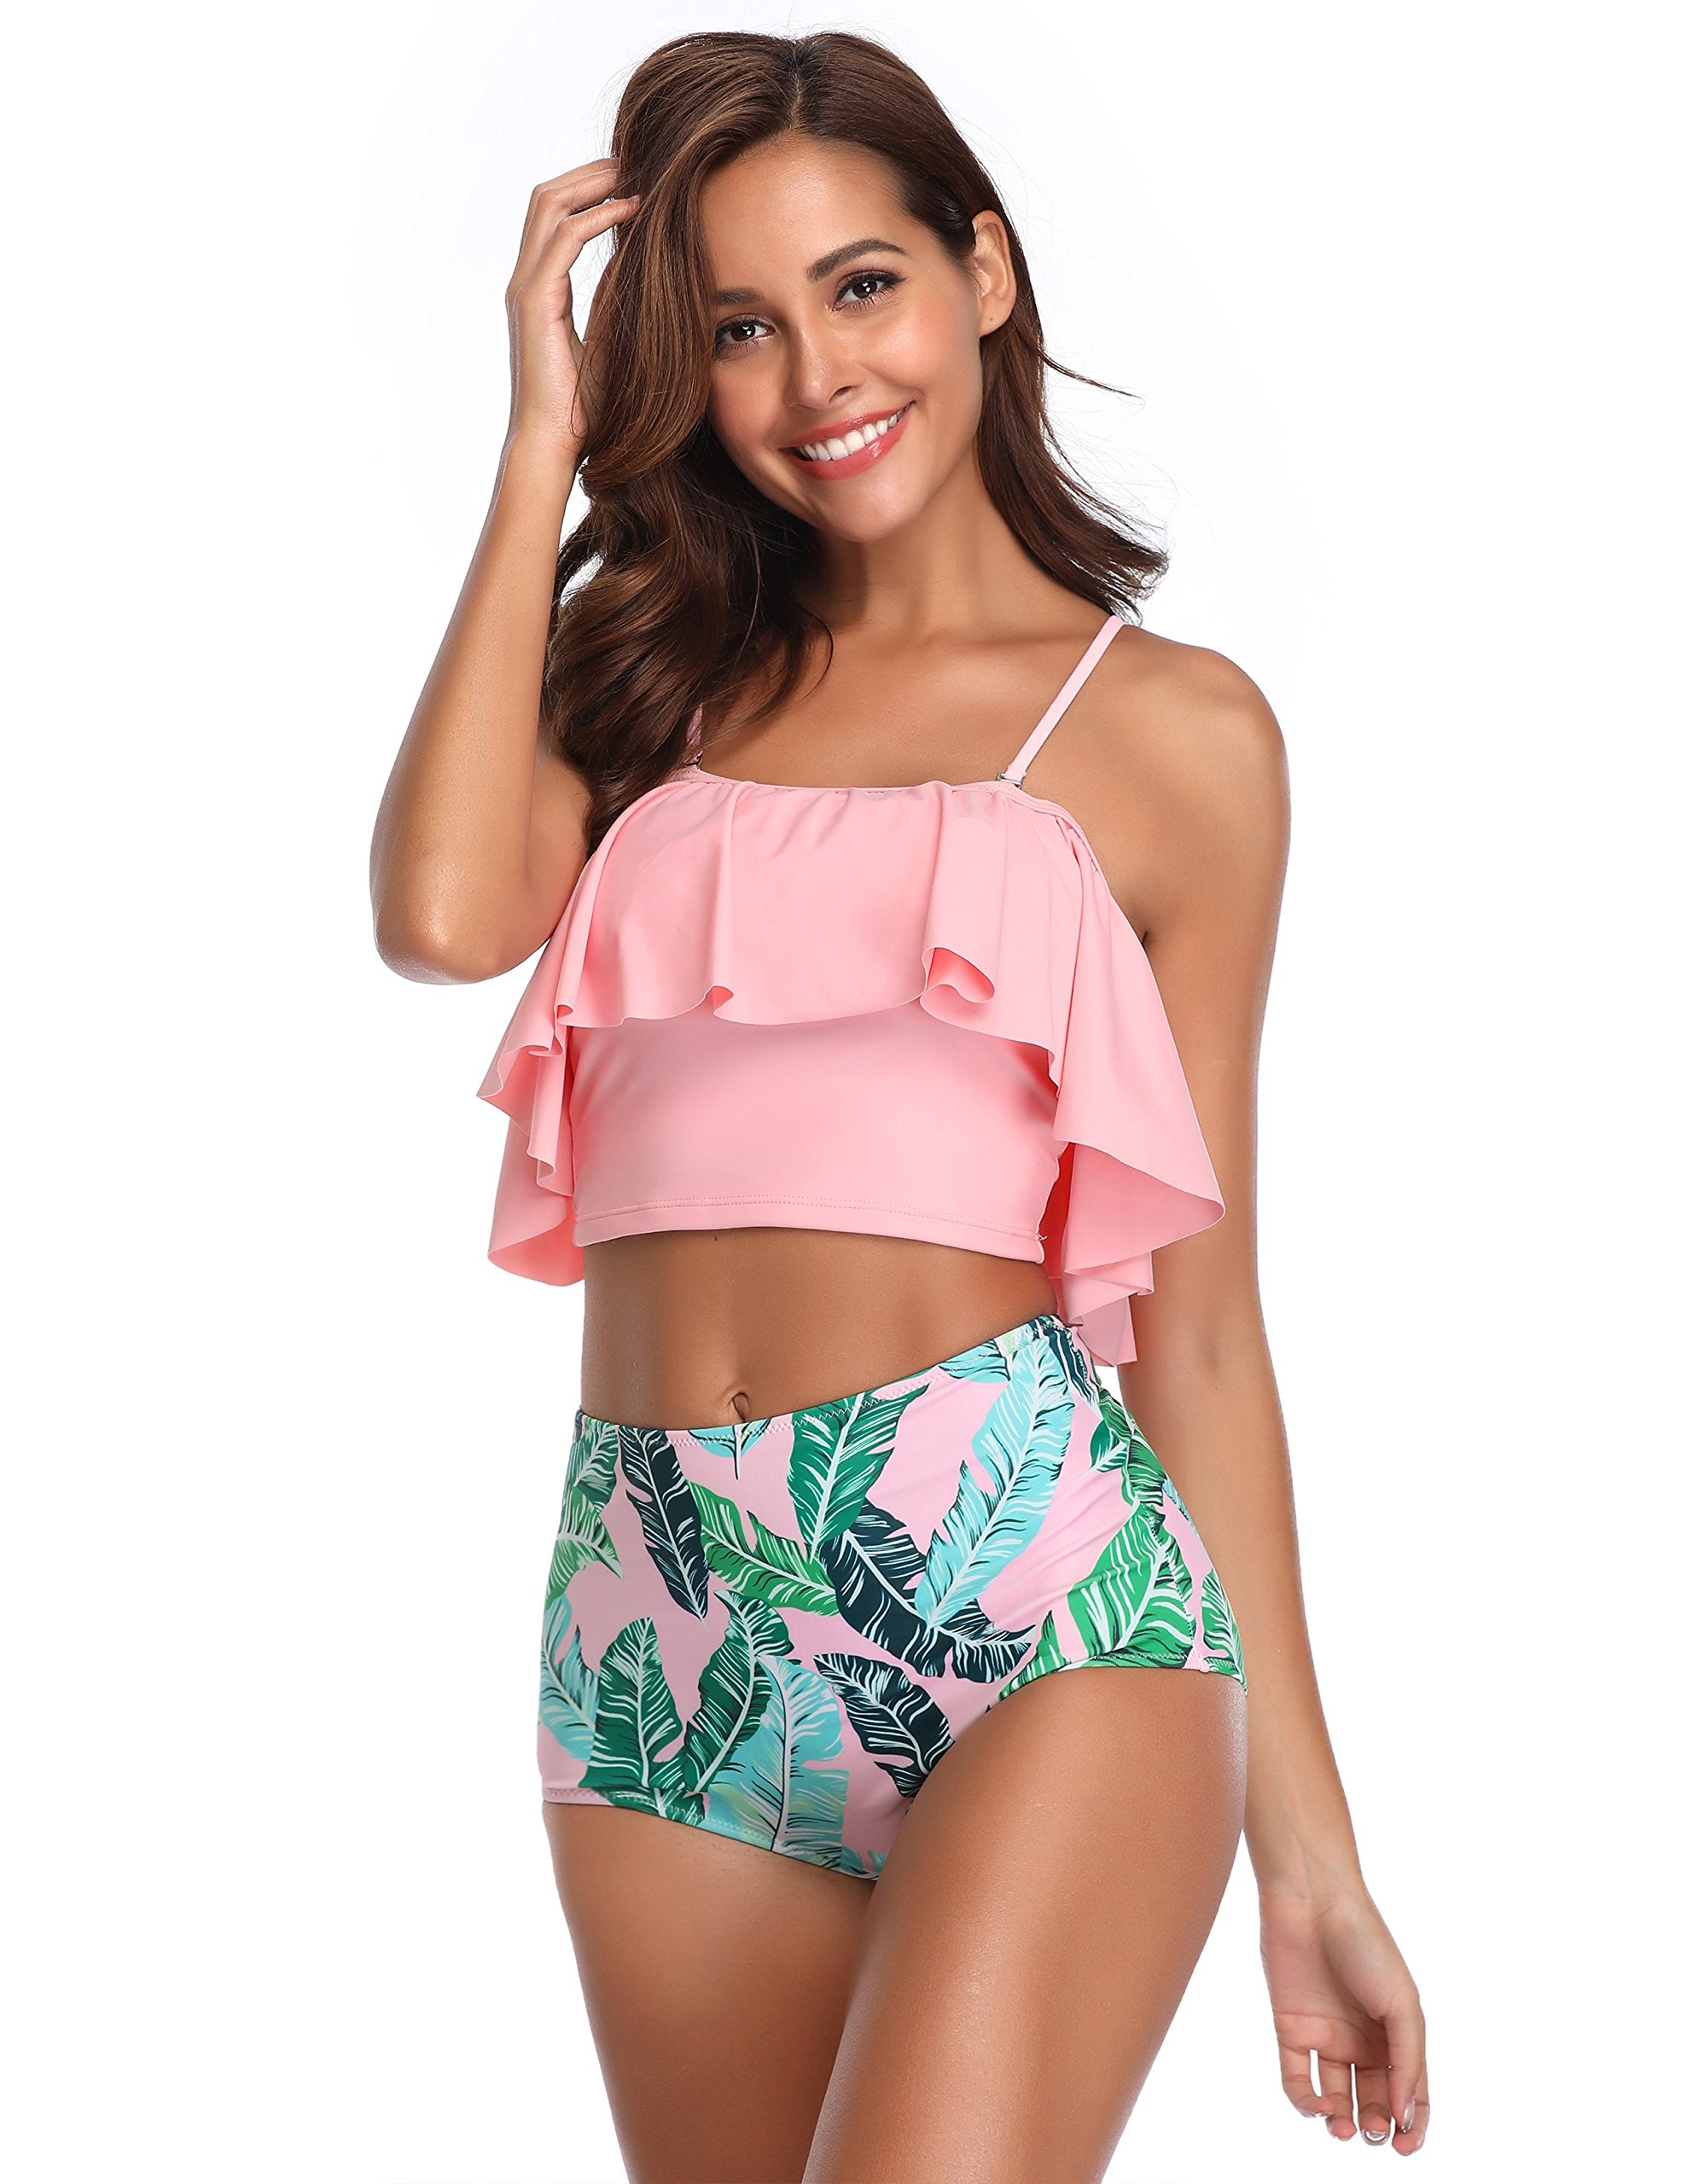 MarinaVida Women Off Shoulder Ruffle Swimsuit Crop Top Two Piece Bathing Suit by MarinaVida (Image #4)